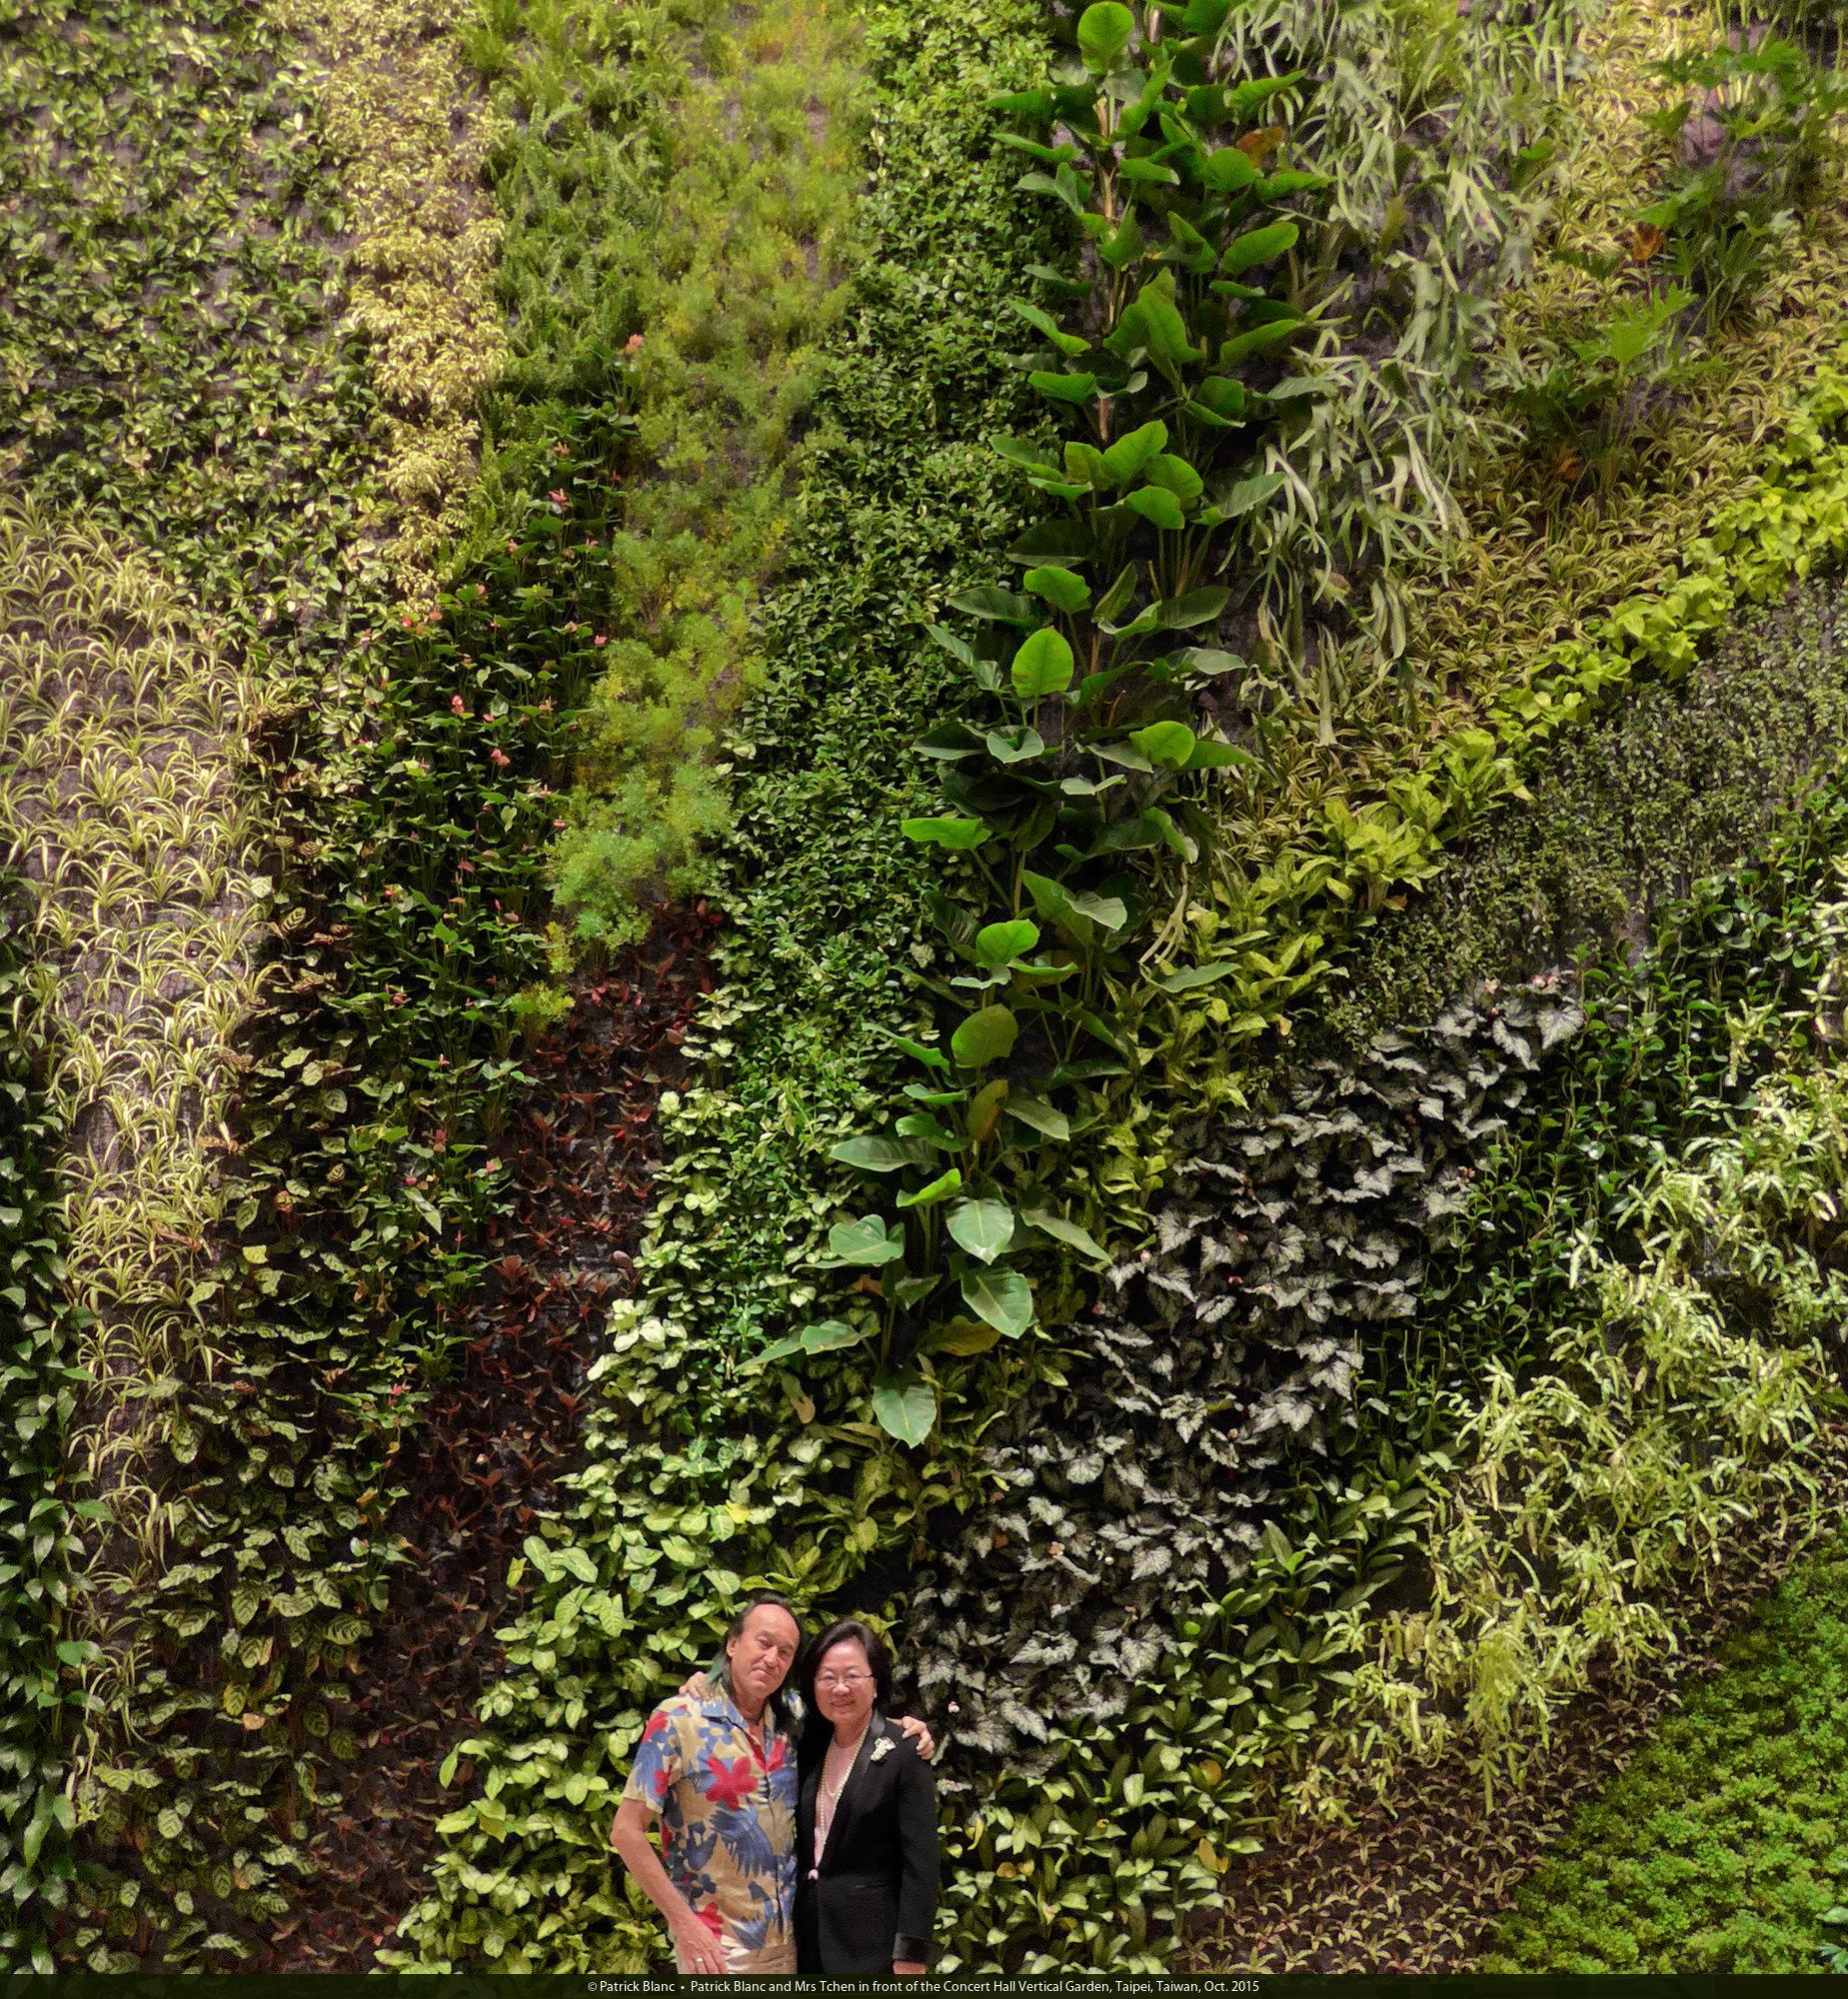 air cleaner angeles yoobi design los by warner living build florafelt garden tucker headquarters for vertical